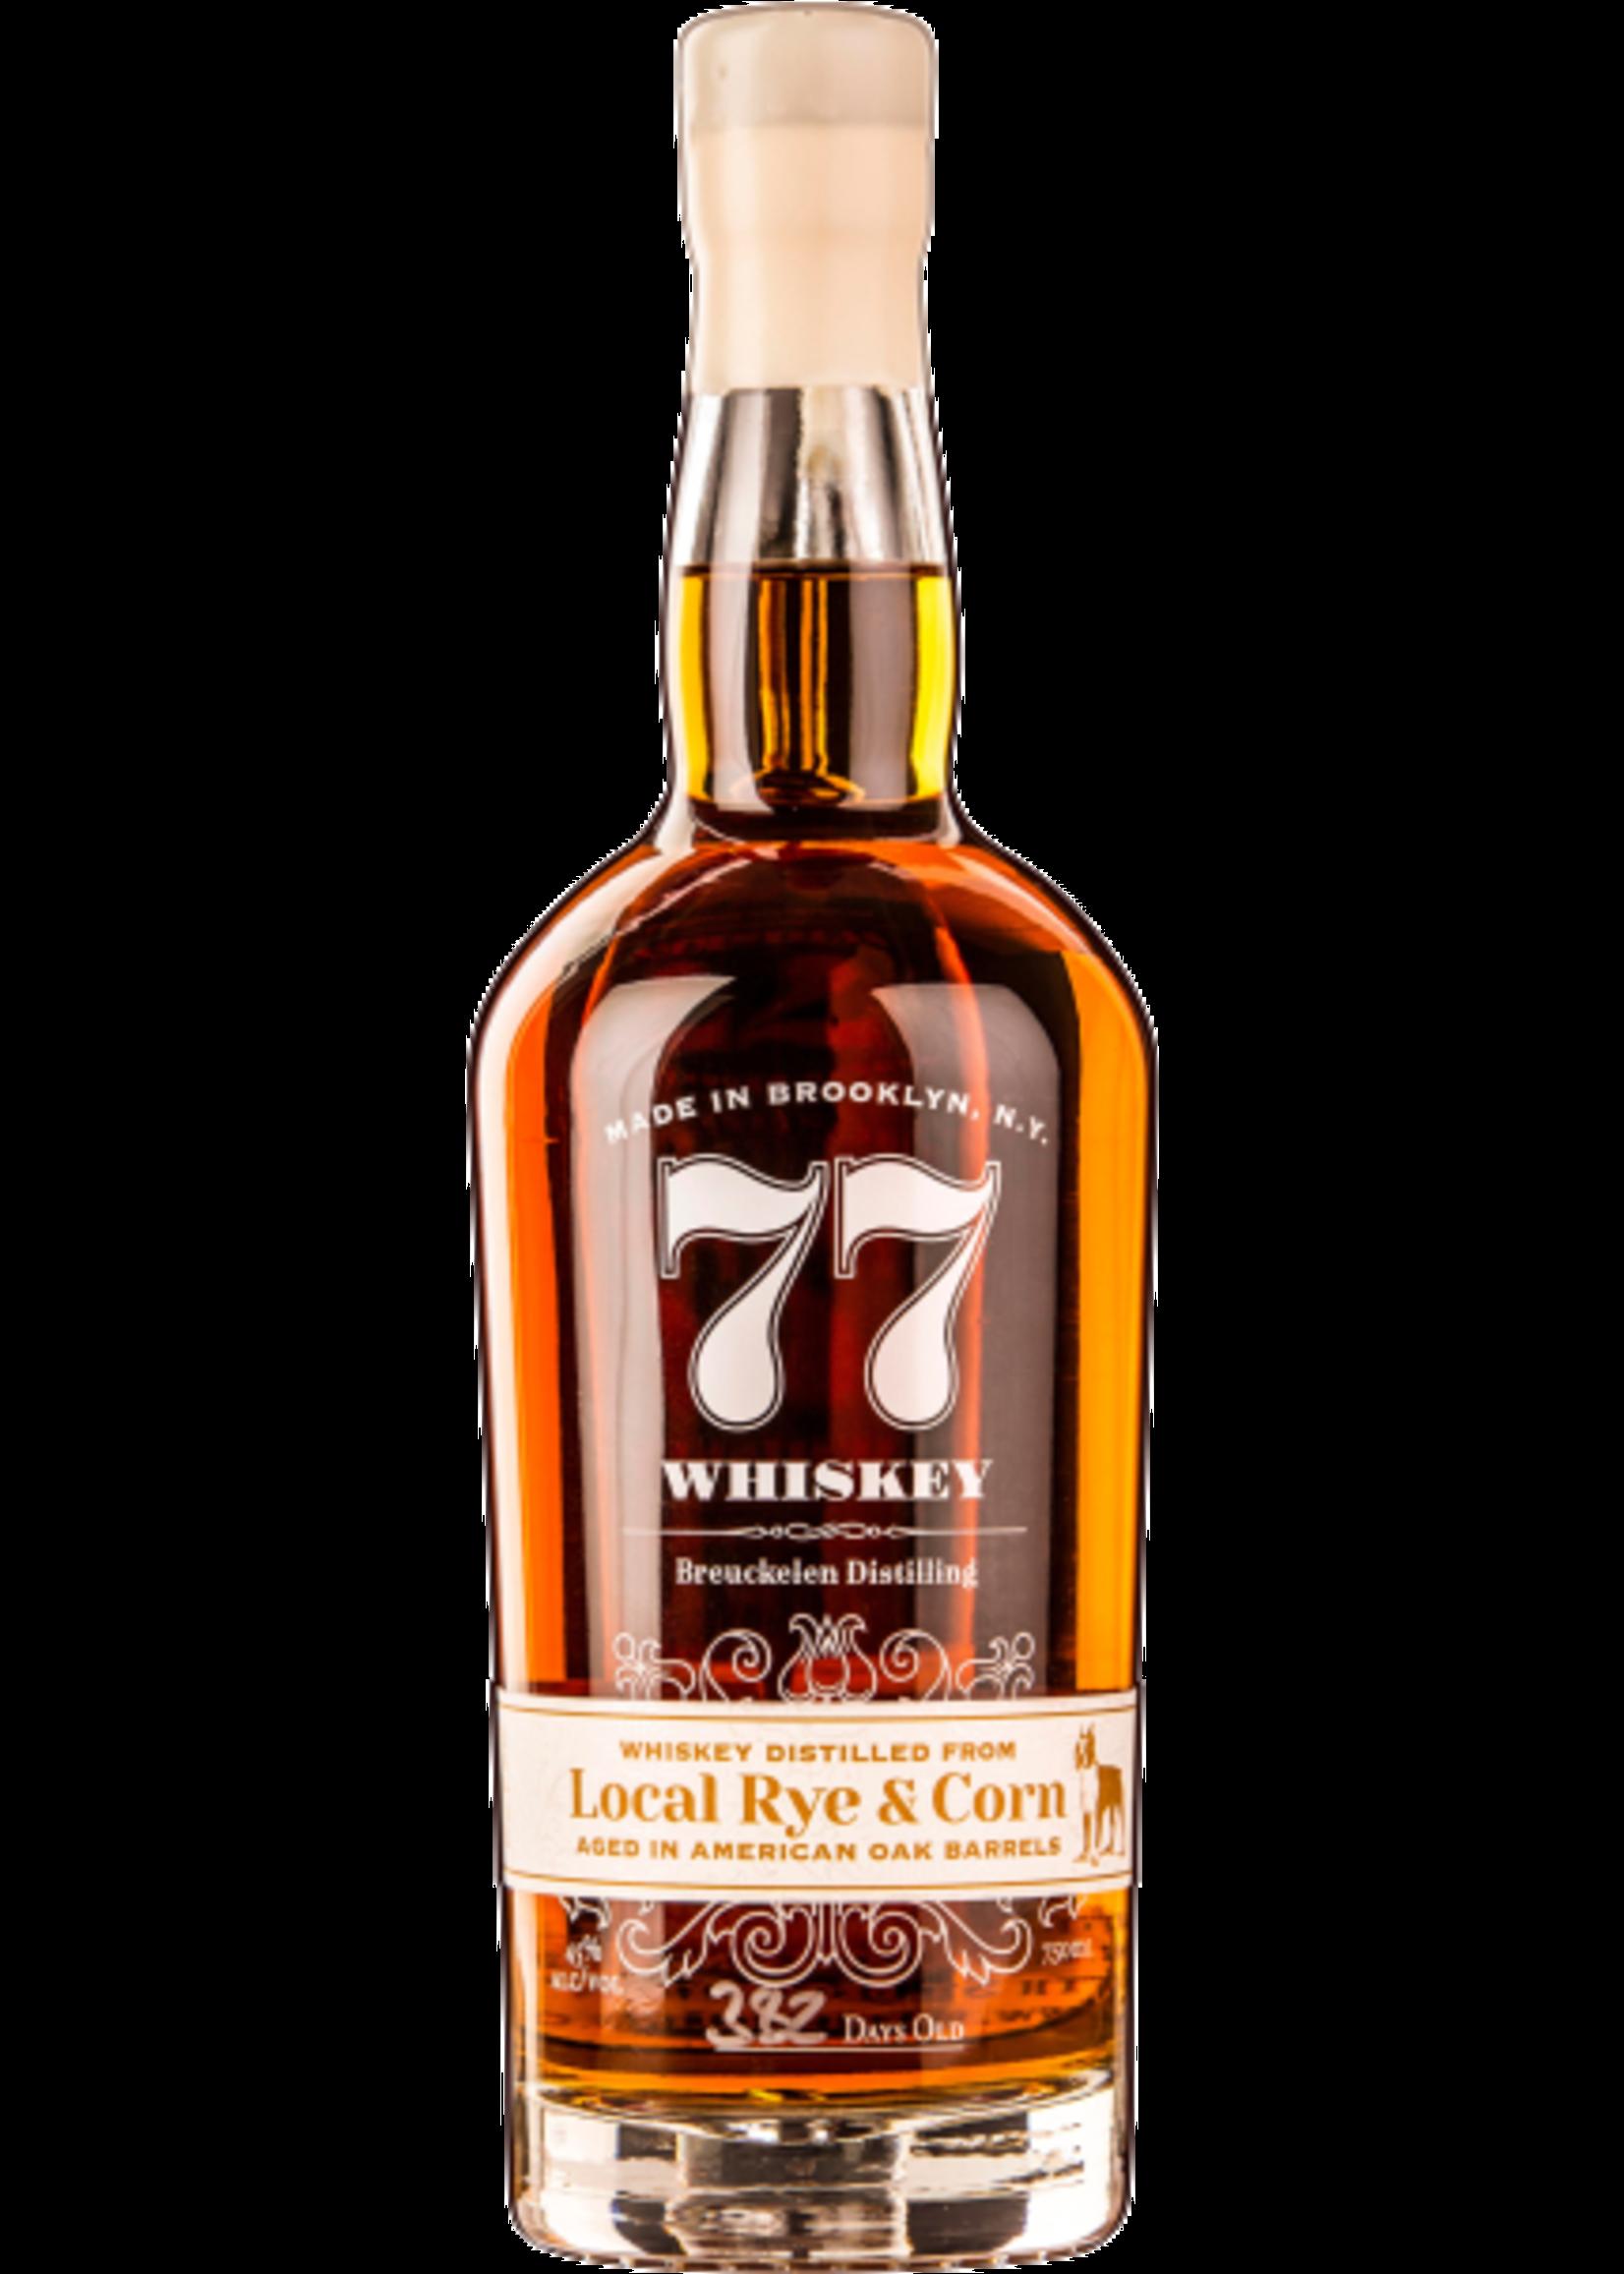 Breuckelen Distilling Breuckelen Distilling / 77 Whiskey / Local Rye & Corn / 750mL